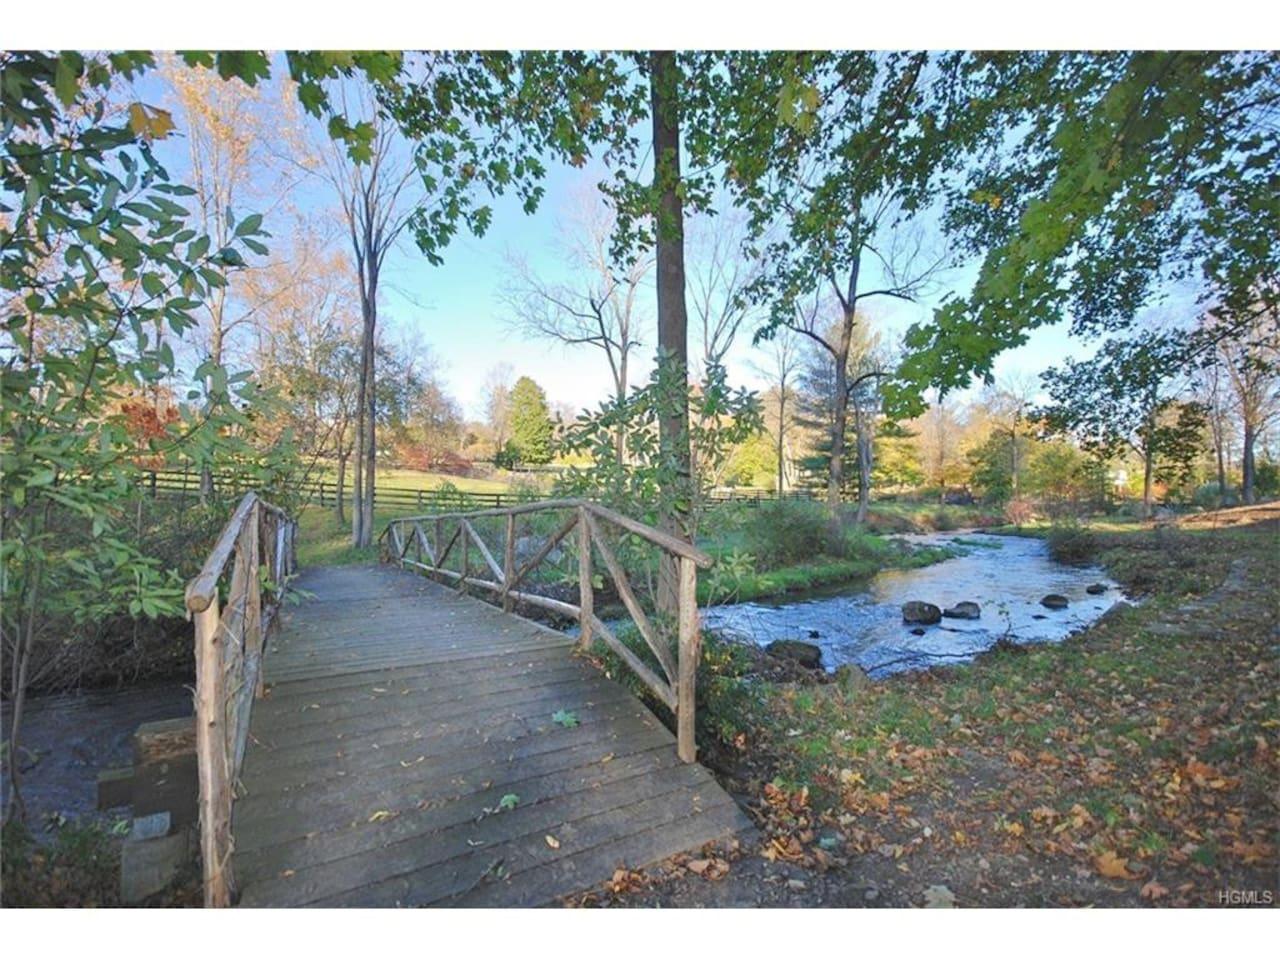 River w/ footbridge